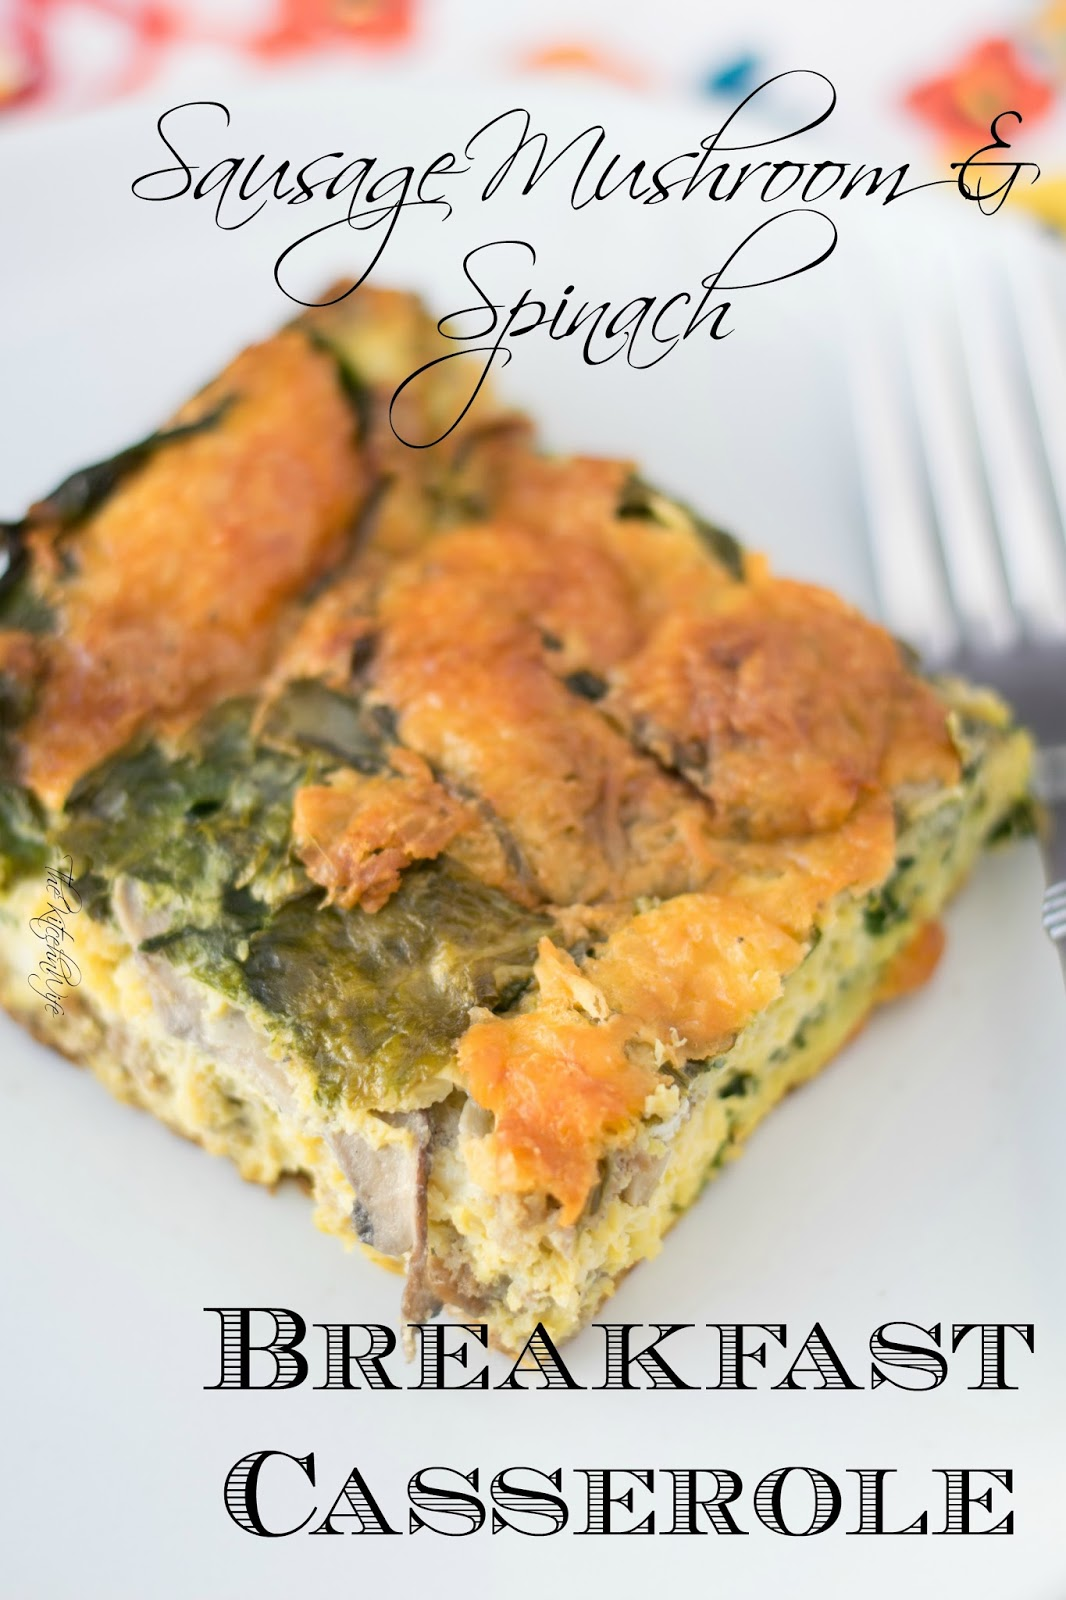 Sausage Mushroom and Spinach Breakfast Casserole Recipe